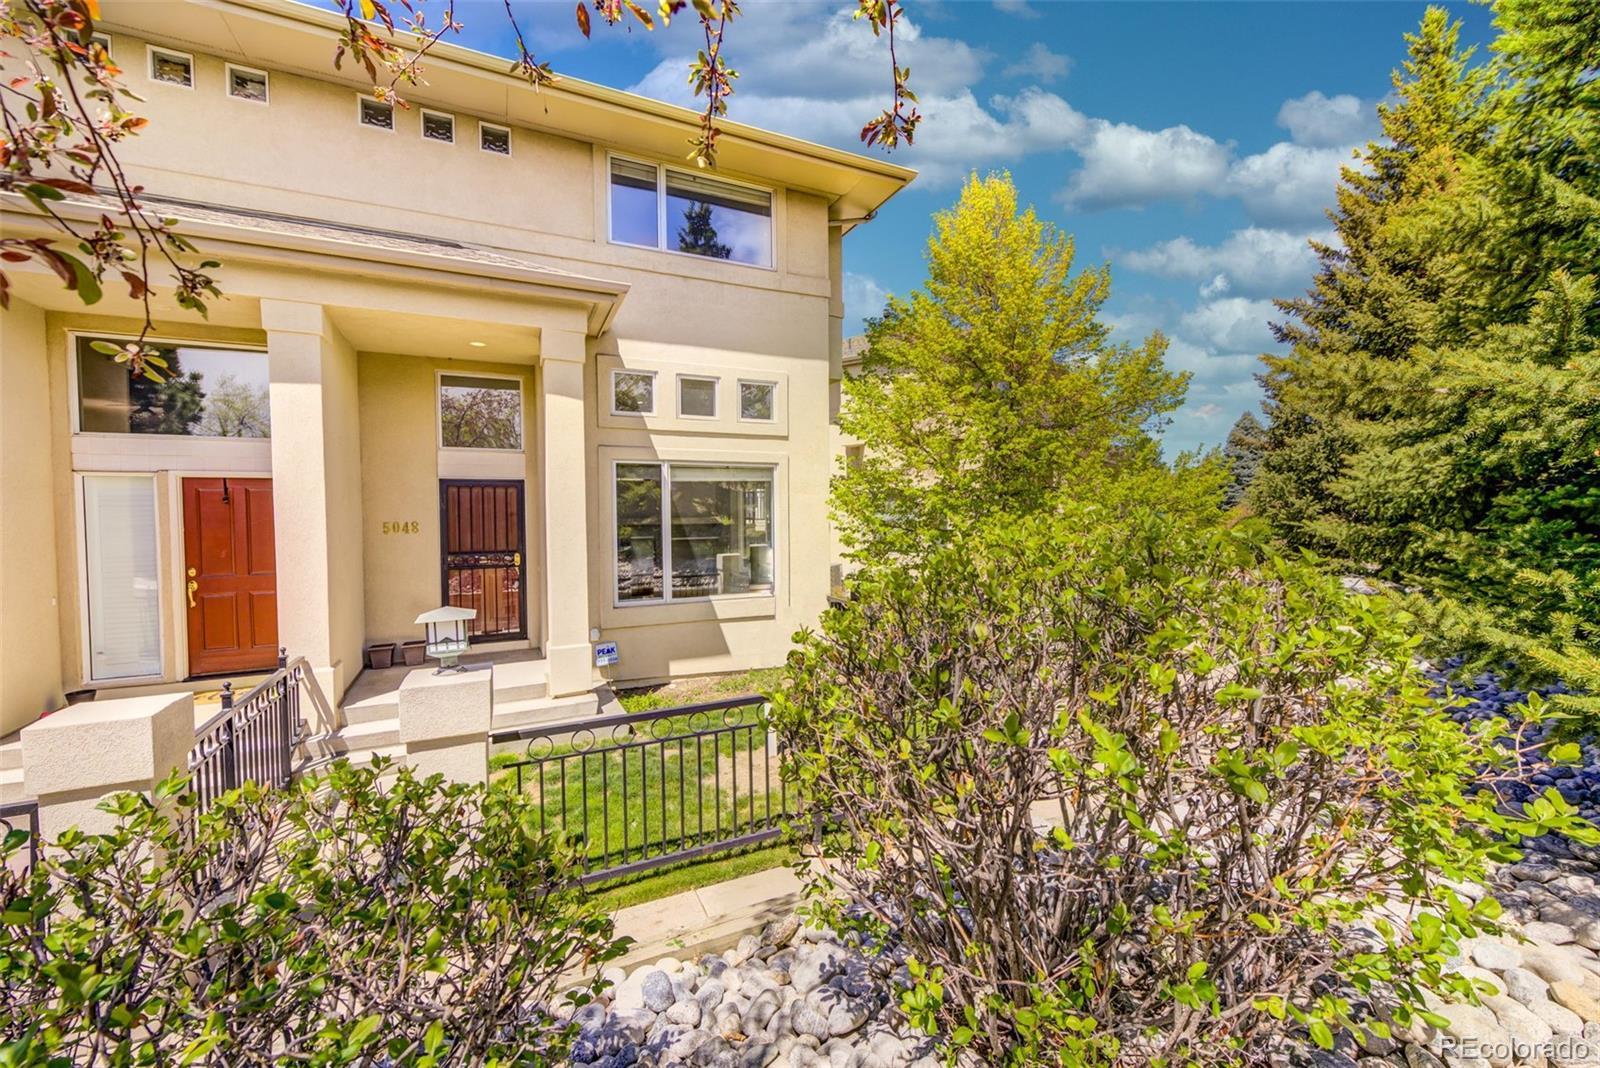 5048 E Cherry Creek South Drive Property Photo - Denver, CO real estate listing